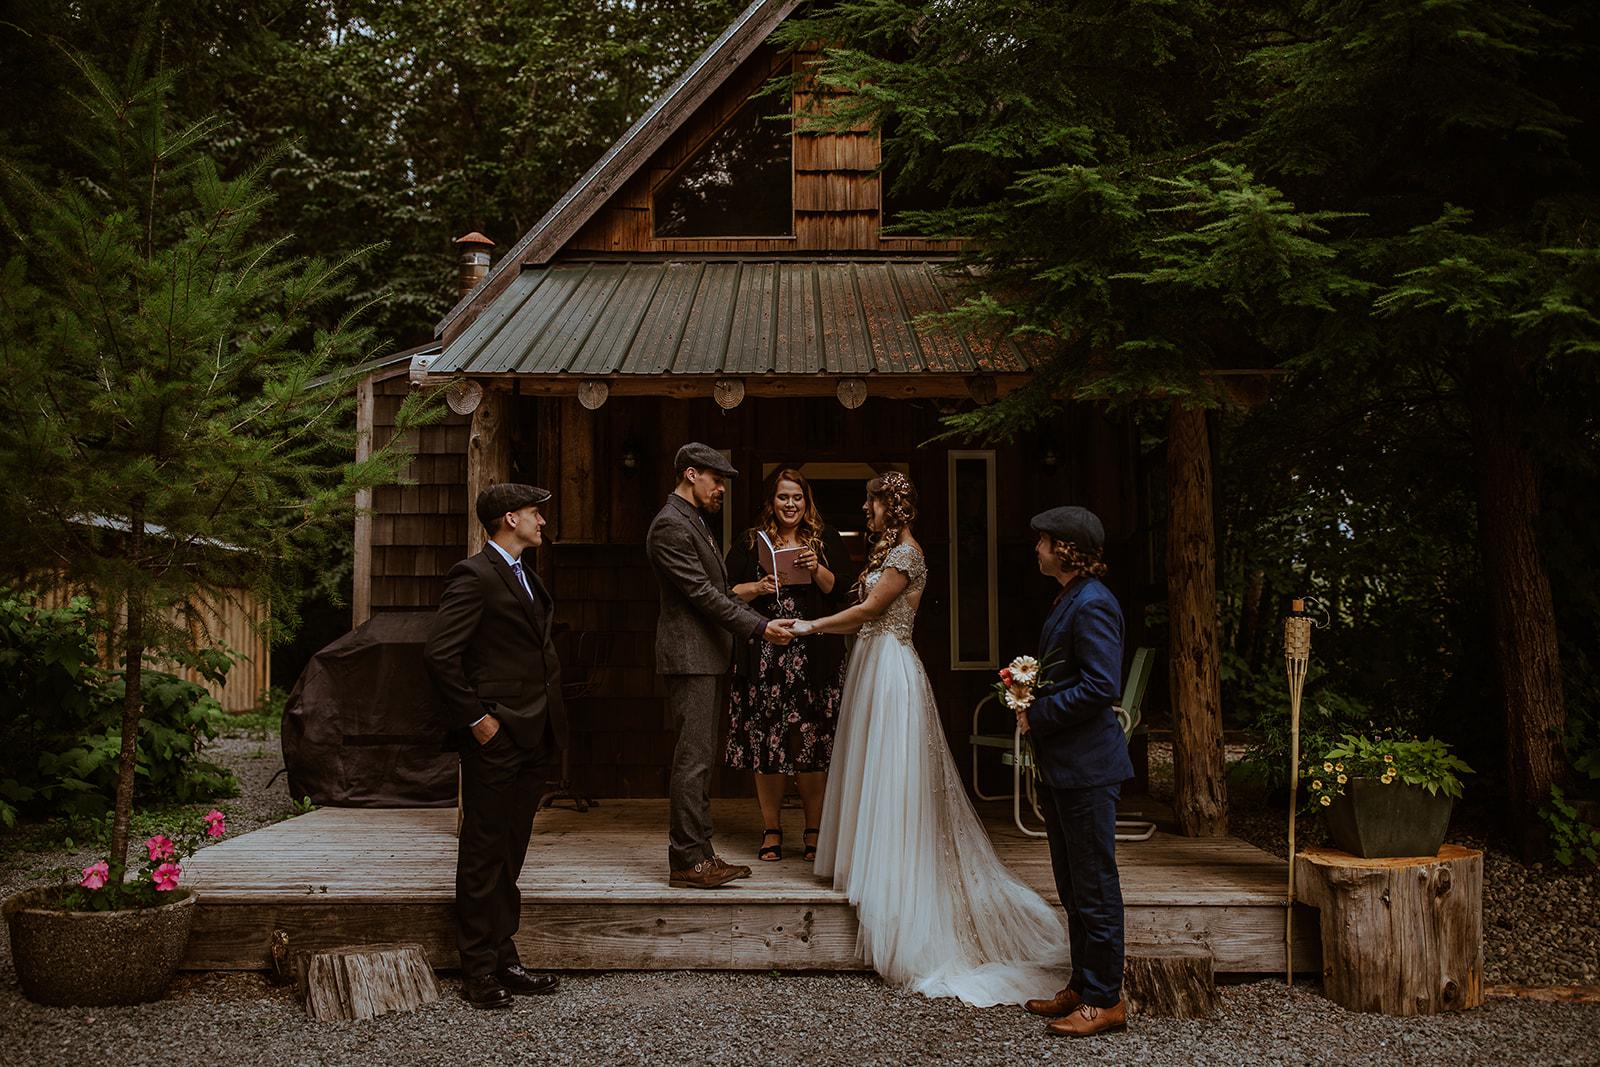 mount-rainier-cabin-elopement-megan-gallagher-photography_(235_of_568).jpg